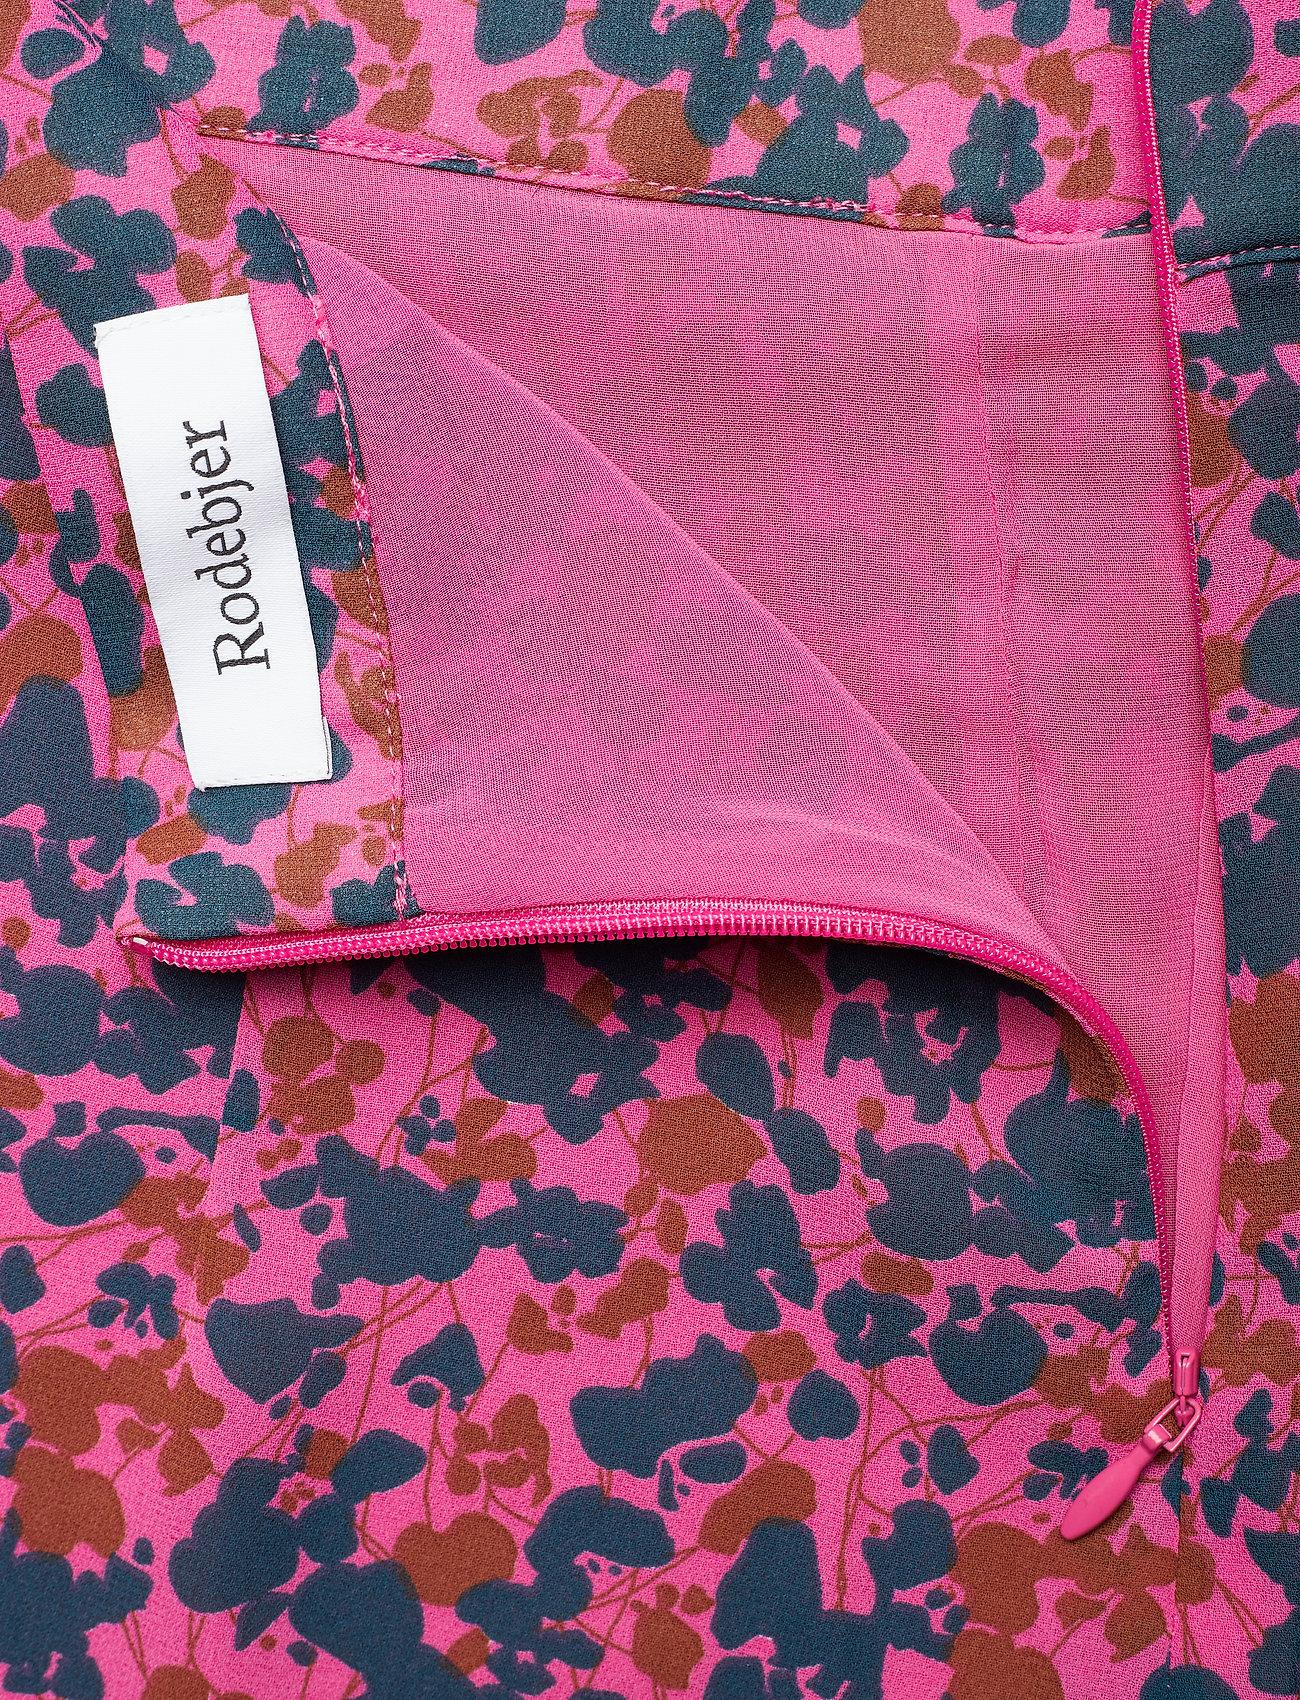 RODEBJER Rodebjer Nola Abstract (Strong Pink), 1017